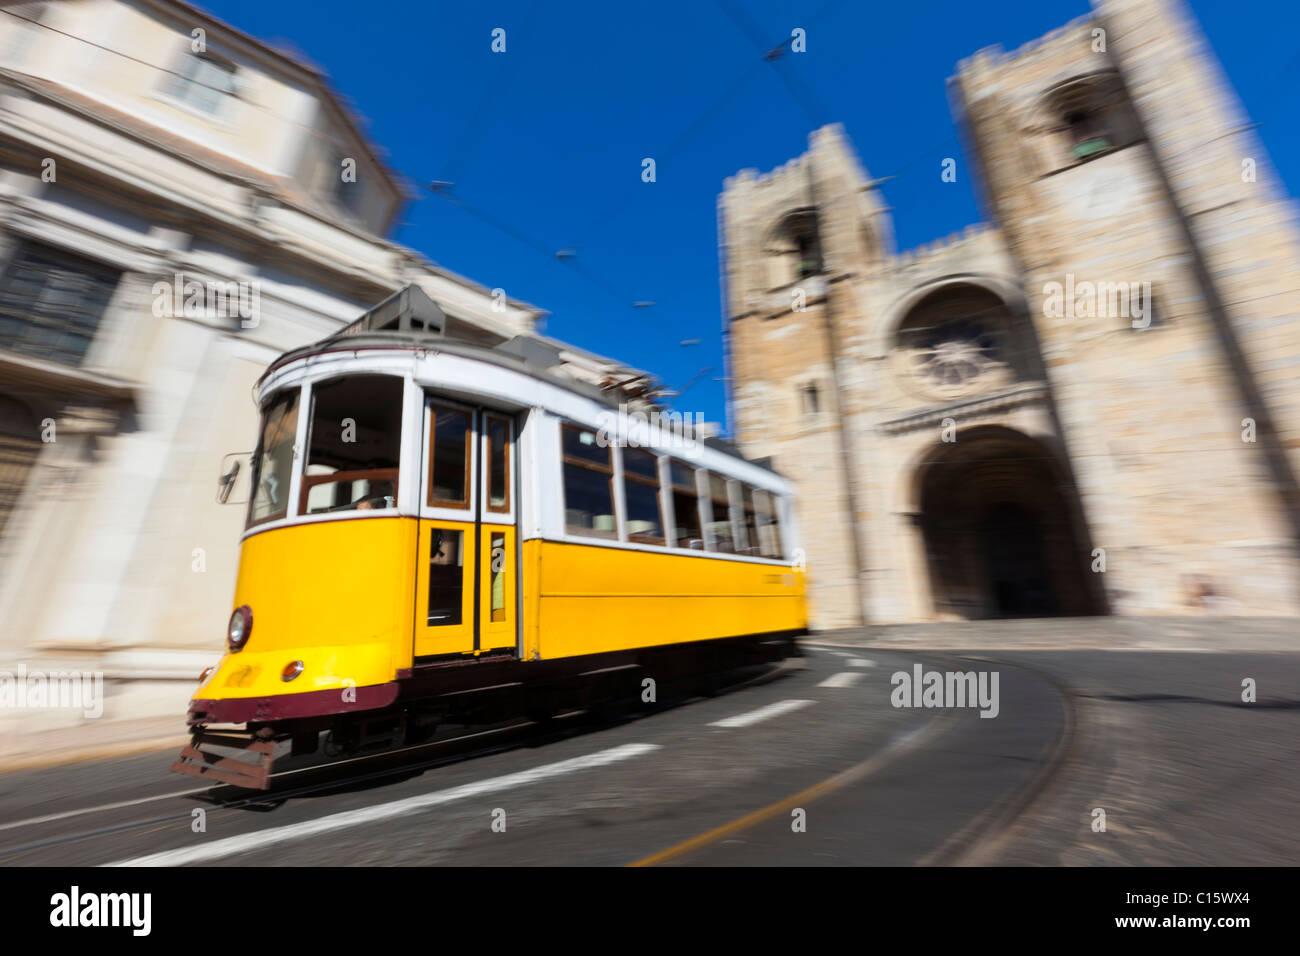 Lisbon Tram with motion blur. - Stock Image